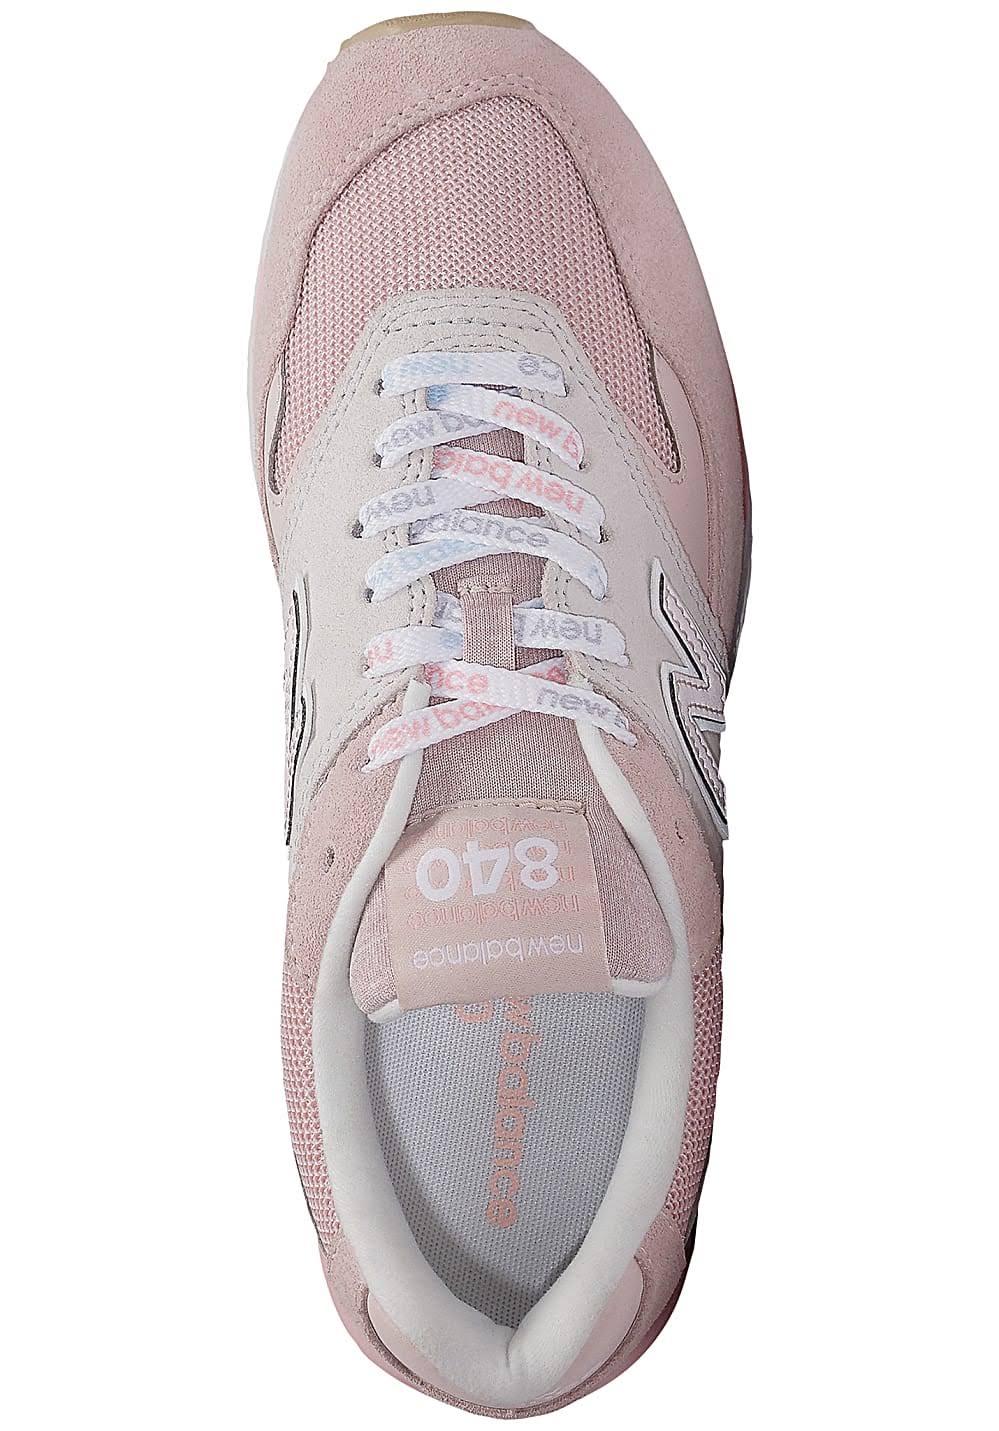 Rosa Shell Balance Wl840rtp New 41 Rosa Conch UaAPP4